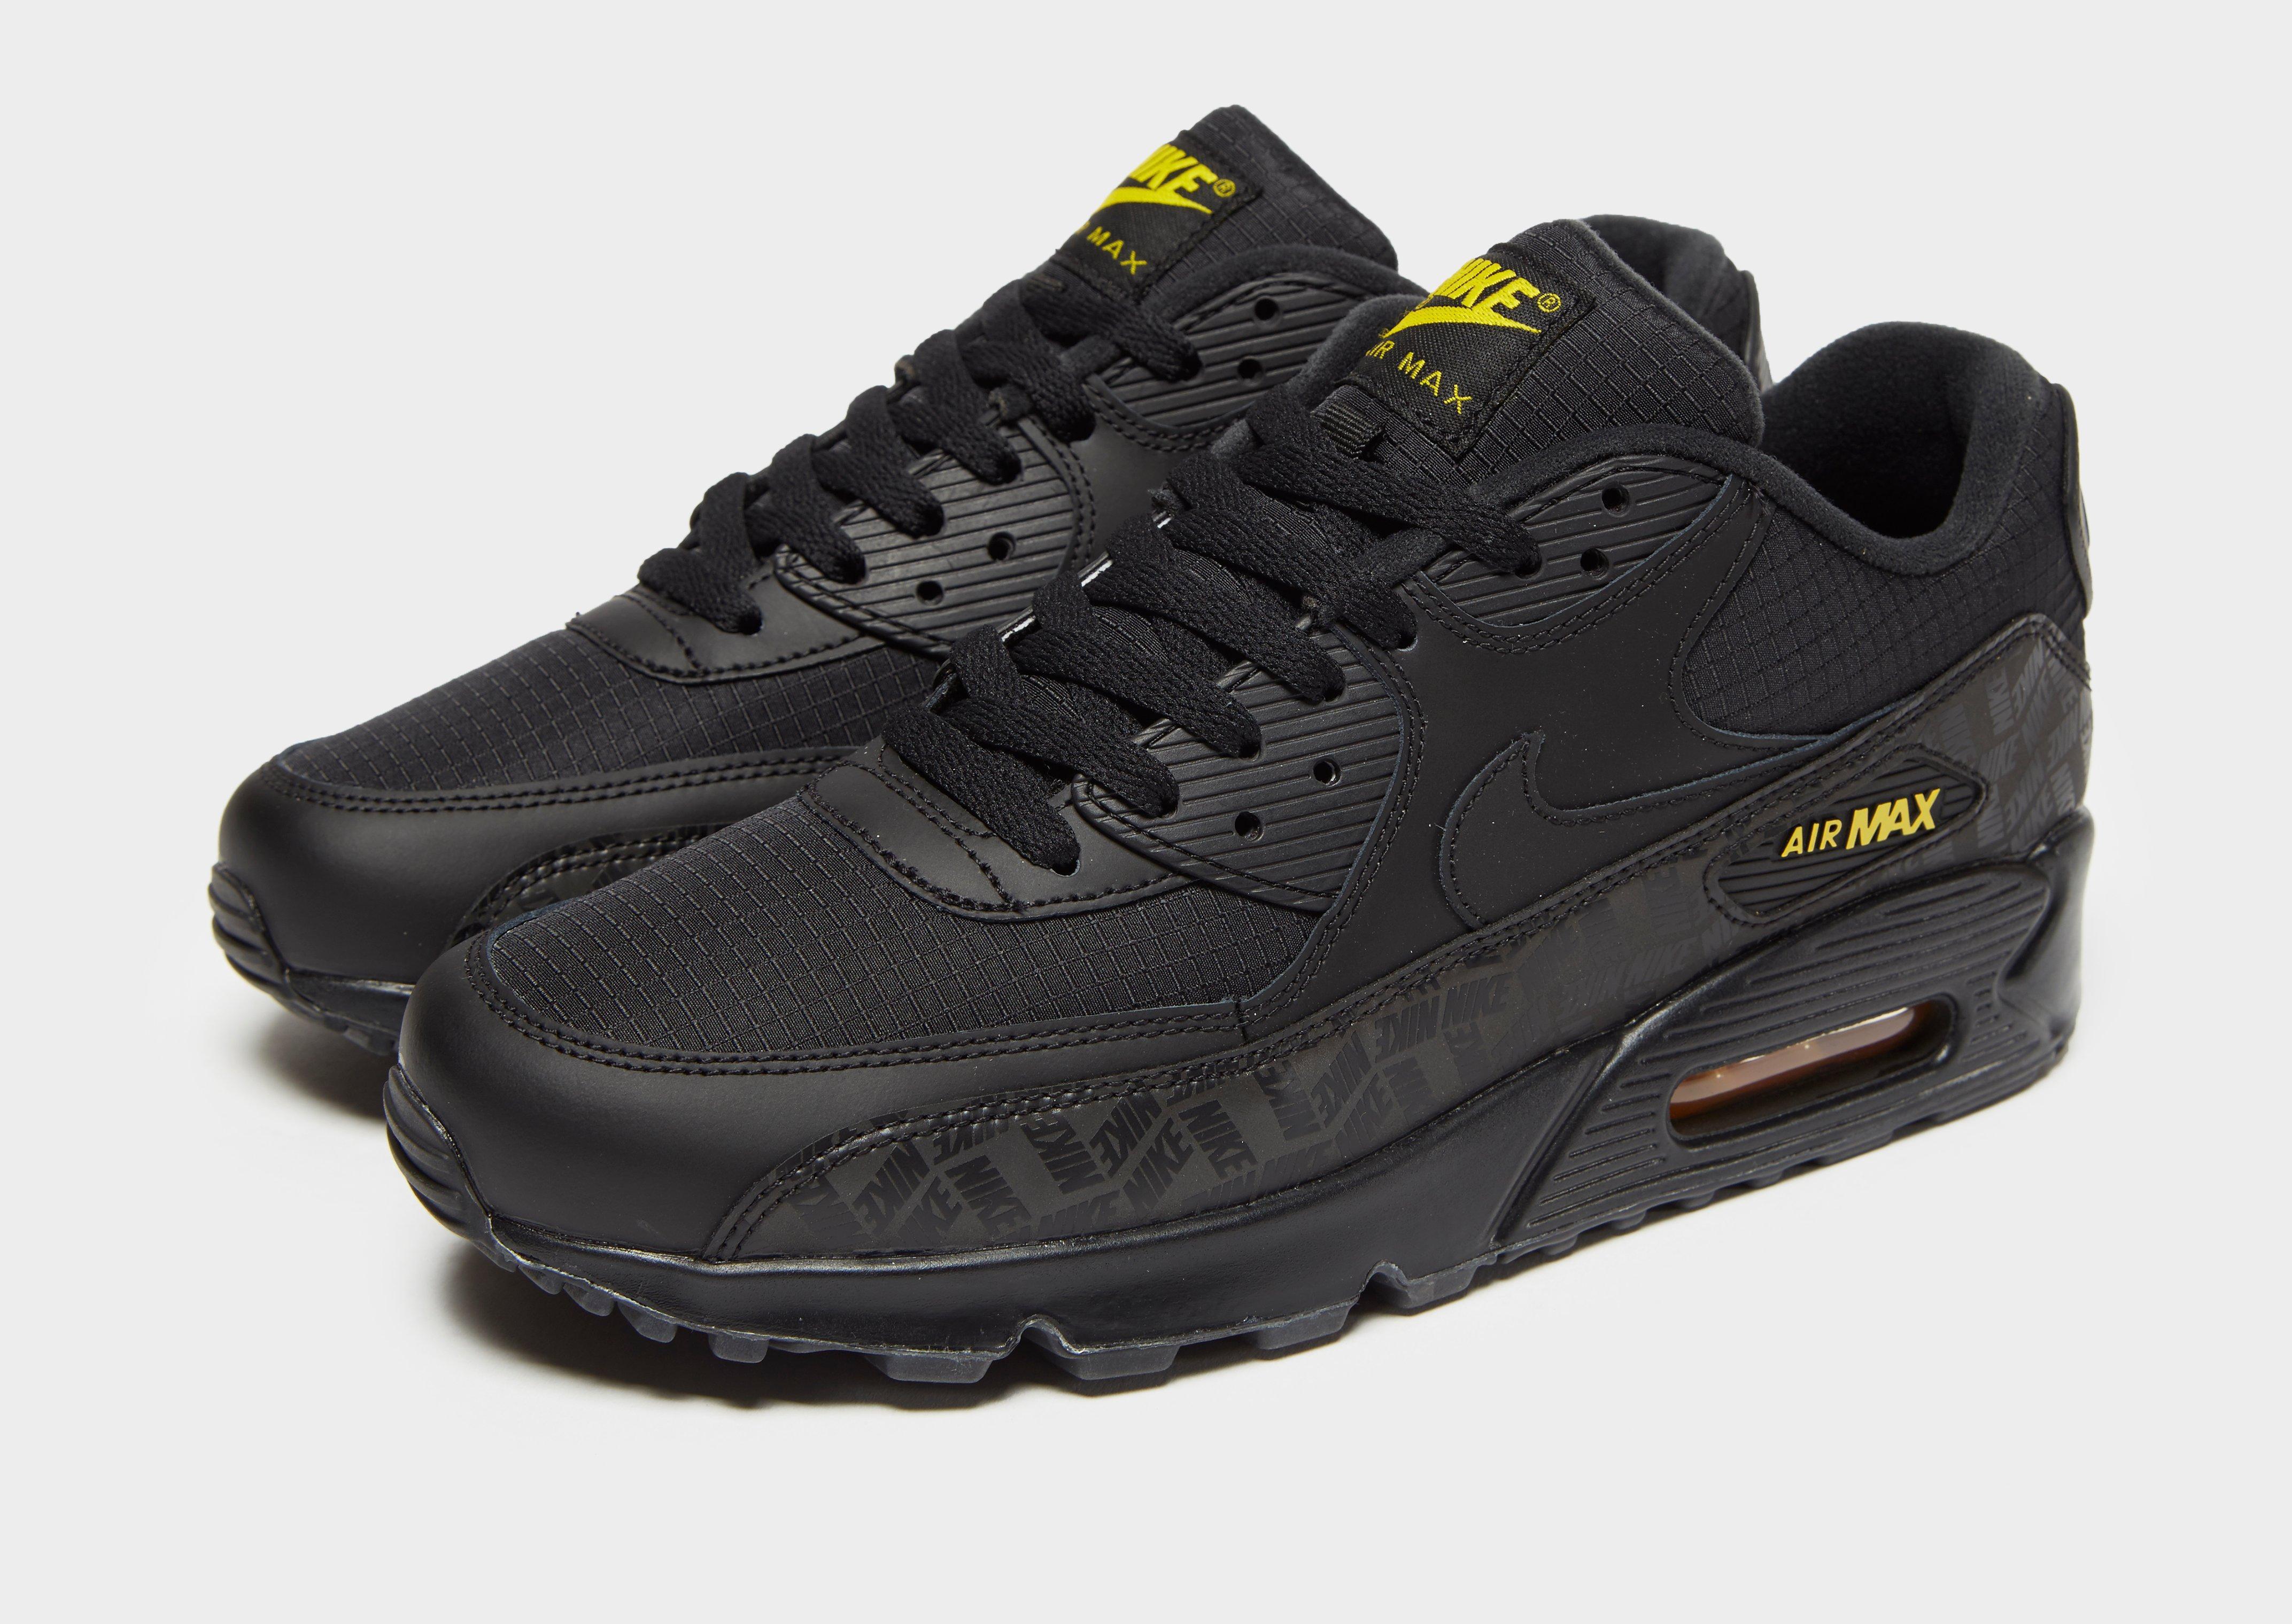 nike air max 90 essential black yellow Off 71%